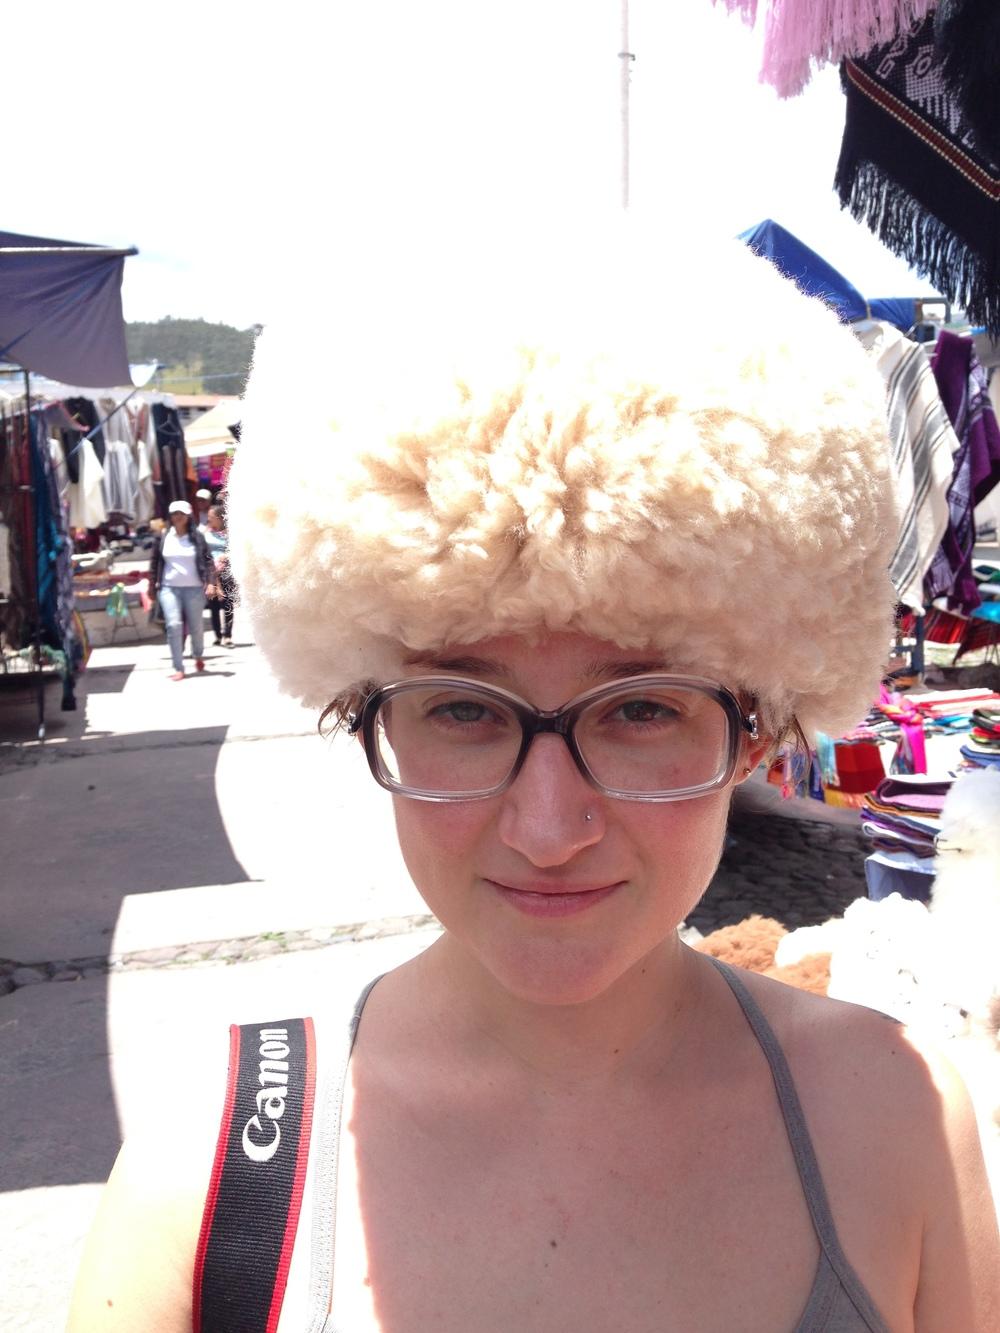 New hat? It's all Llama!